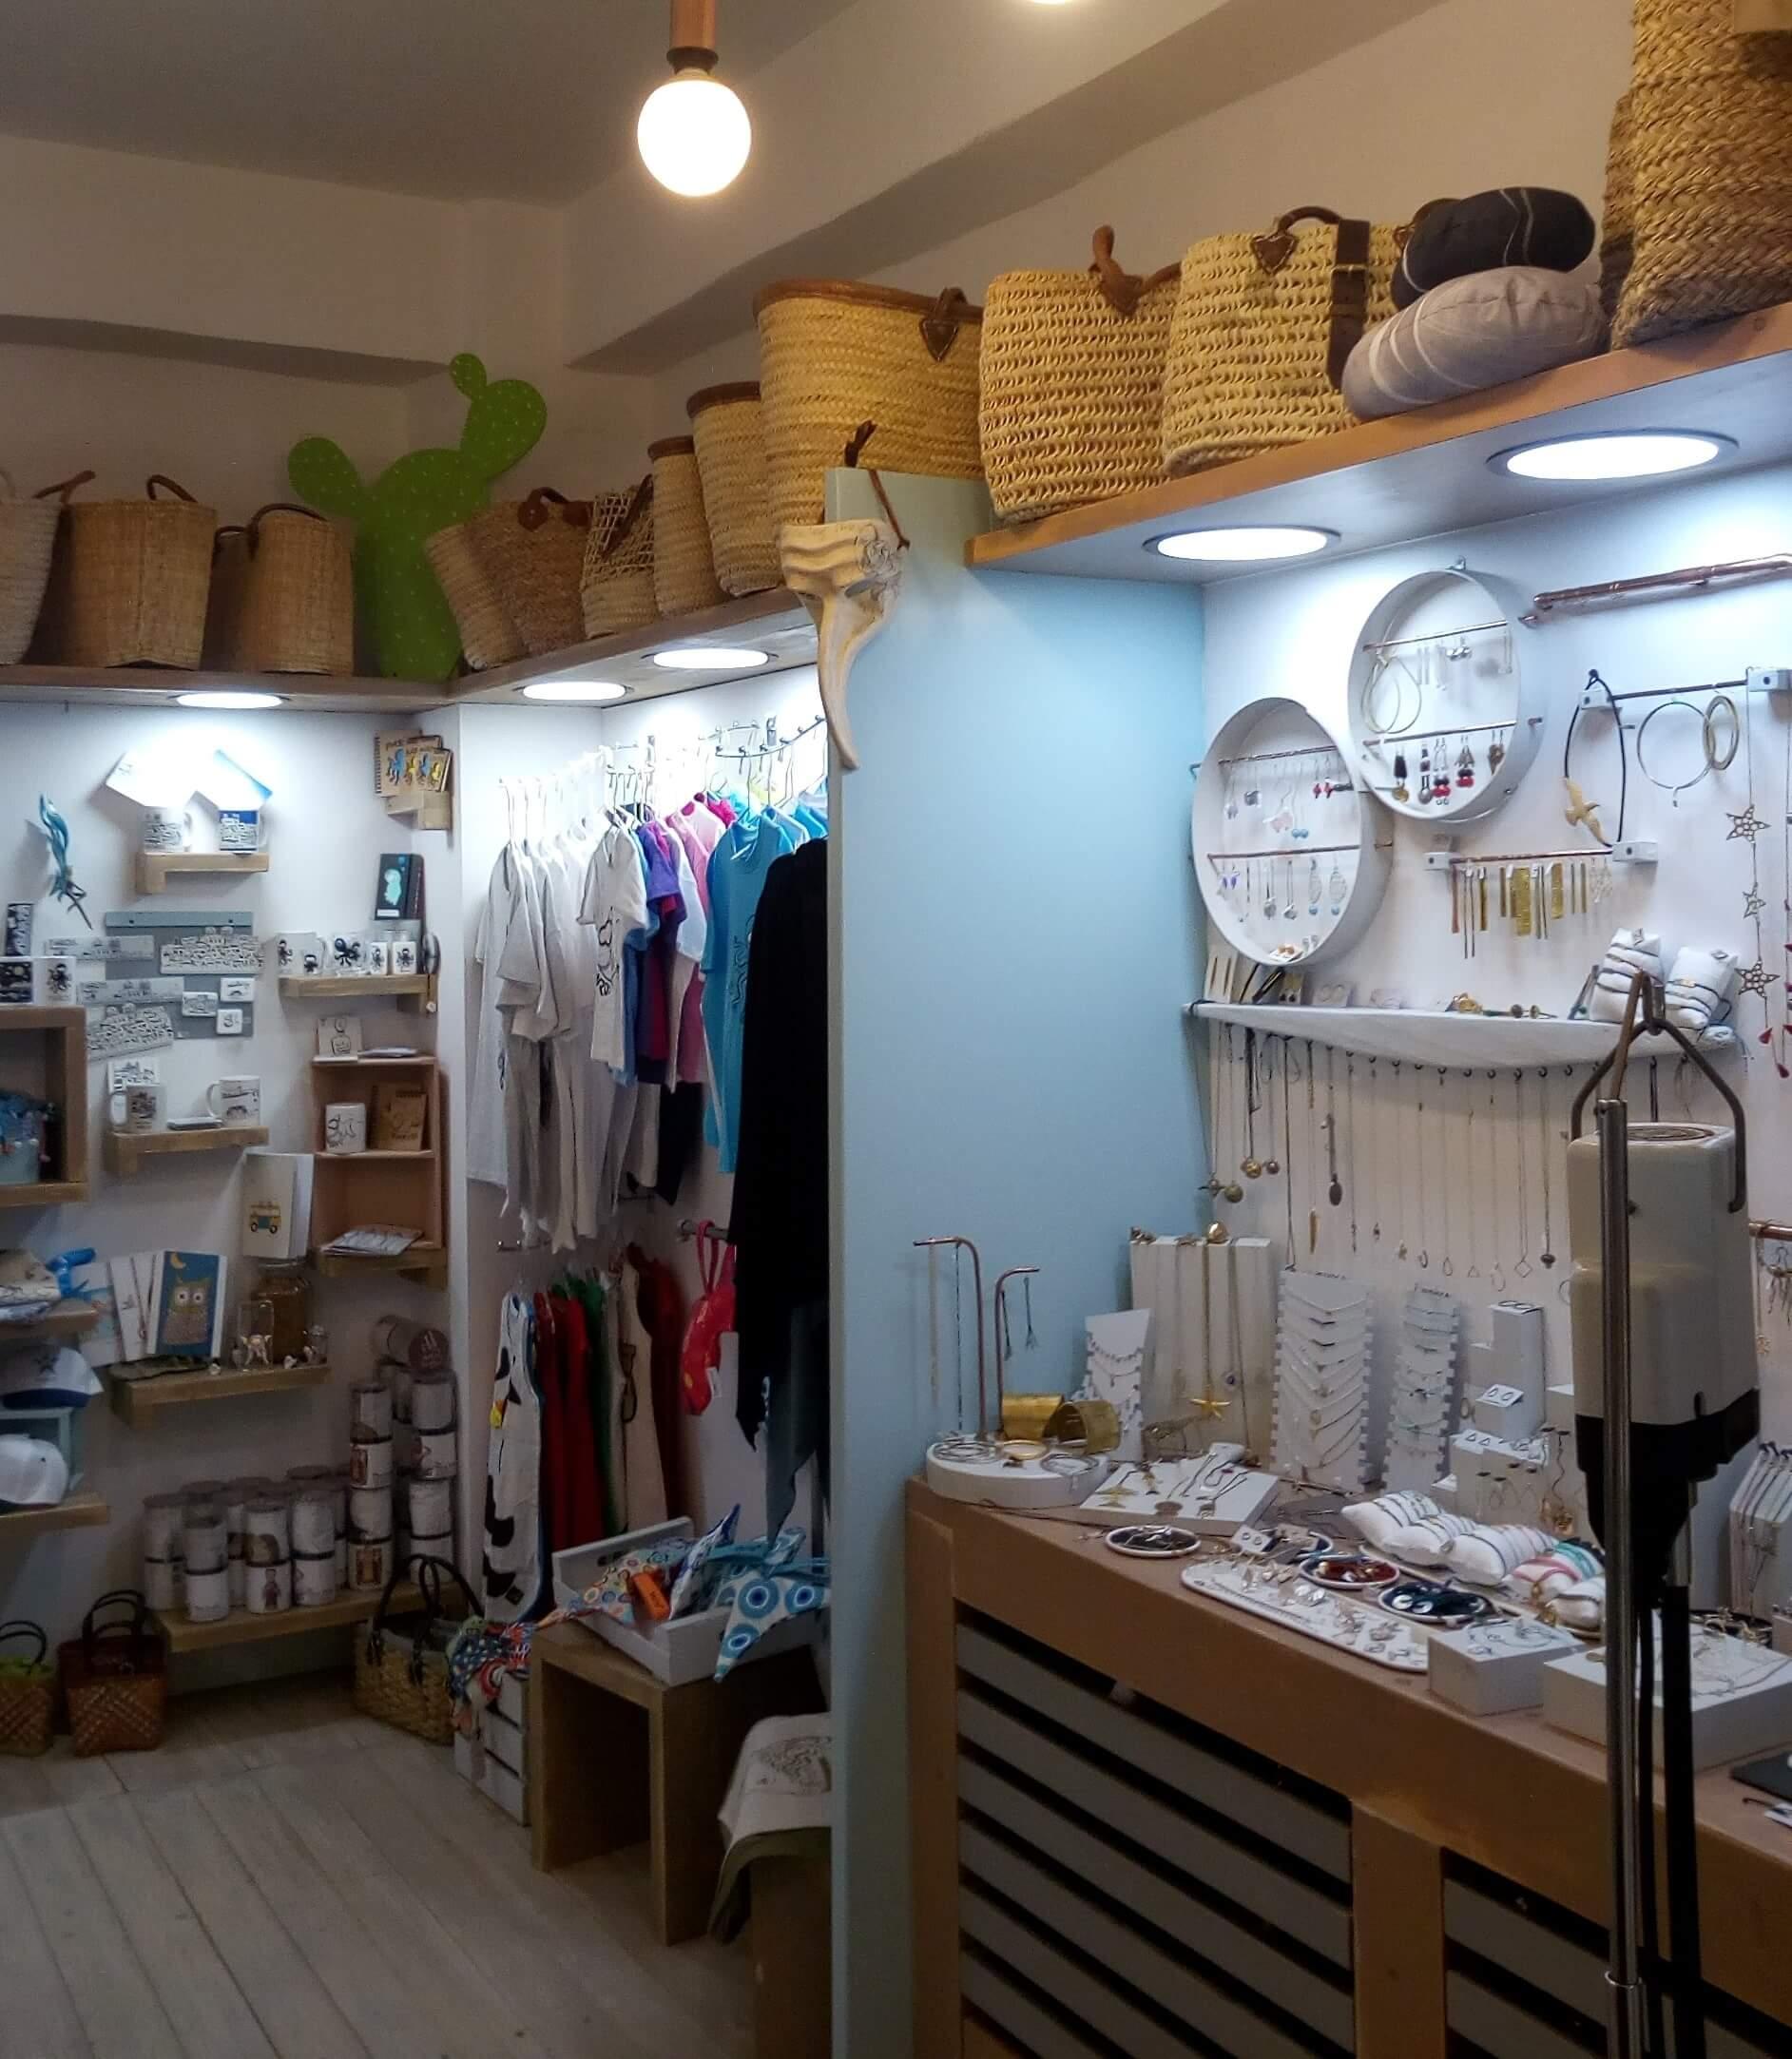 foto of the shop insideC min